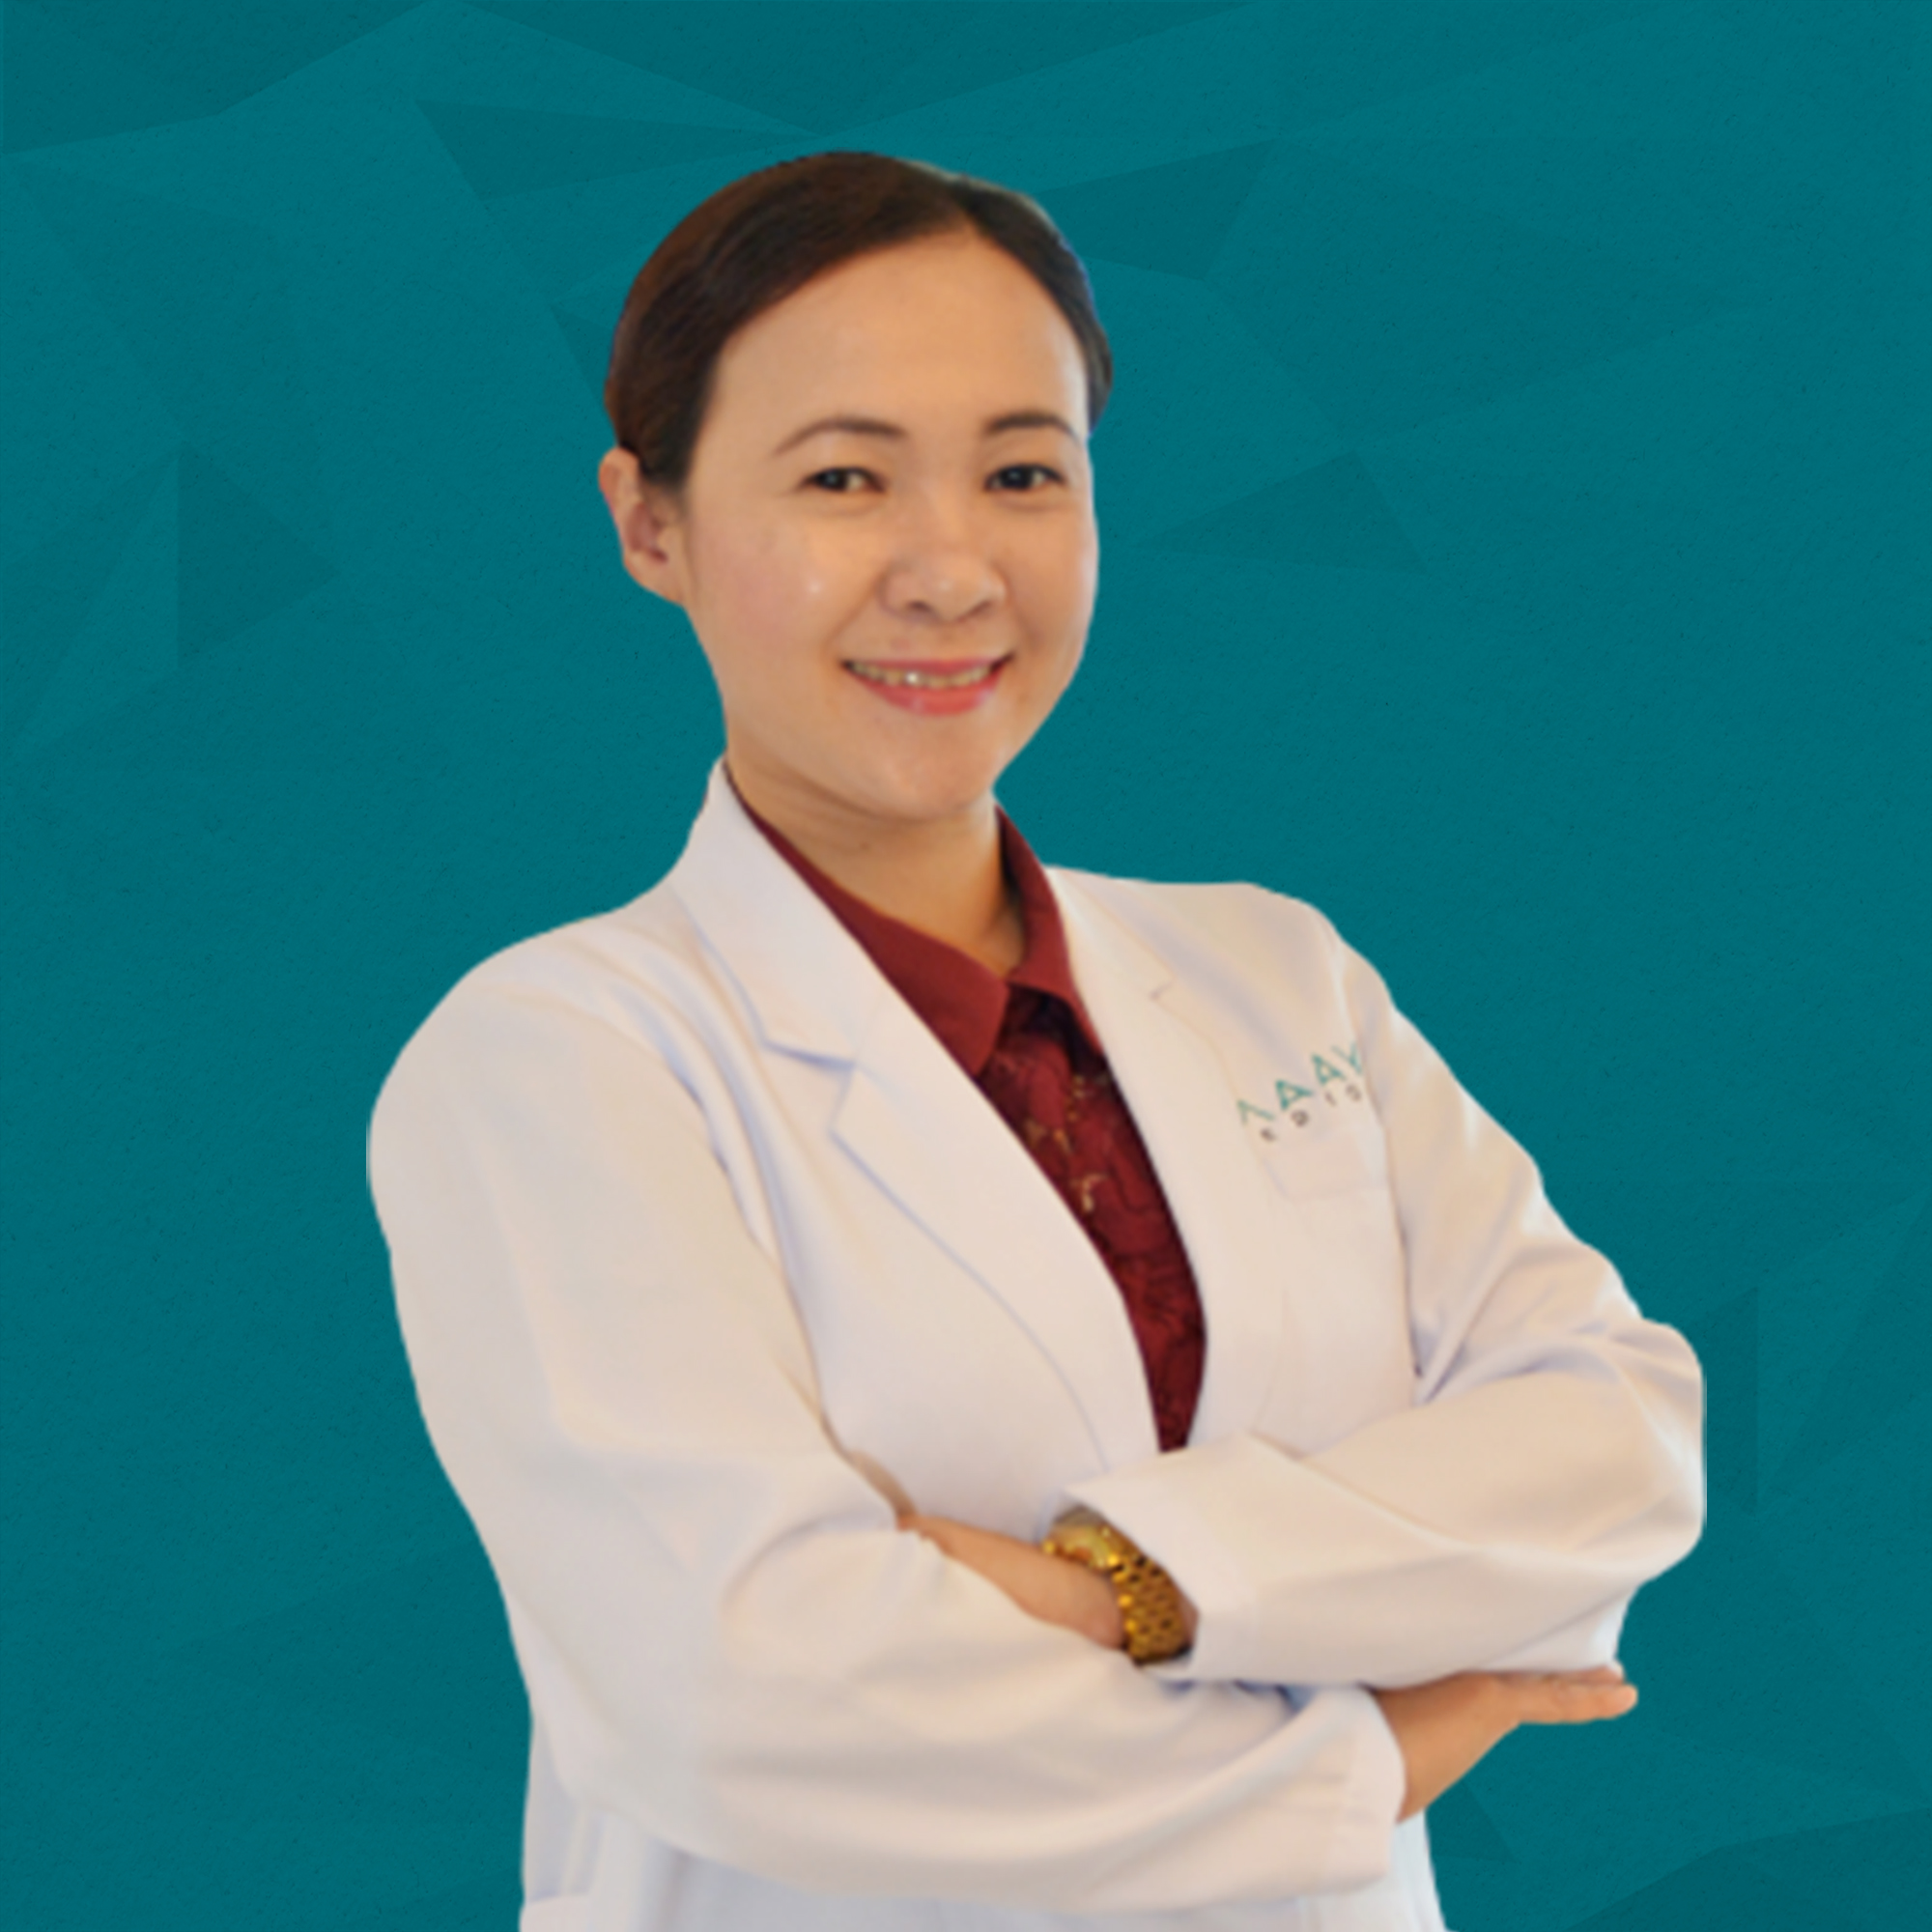 Dr. Pineda, Dynah